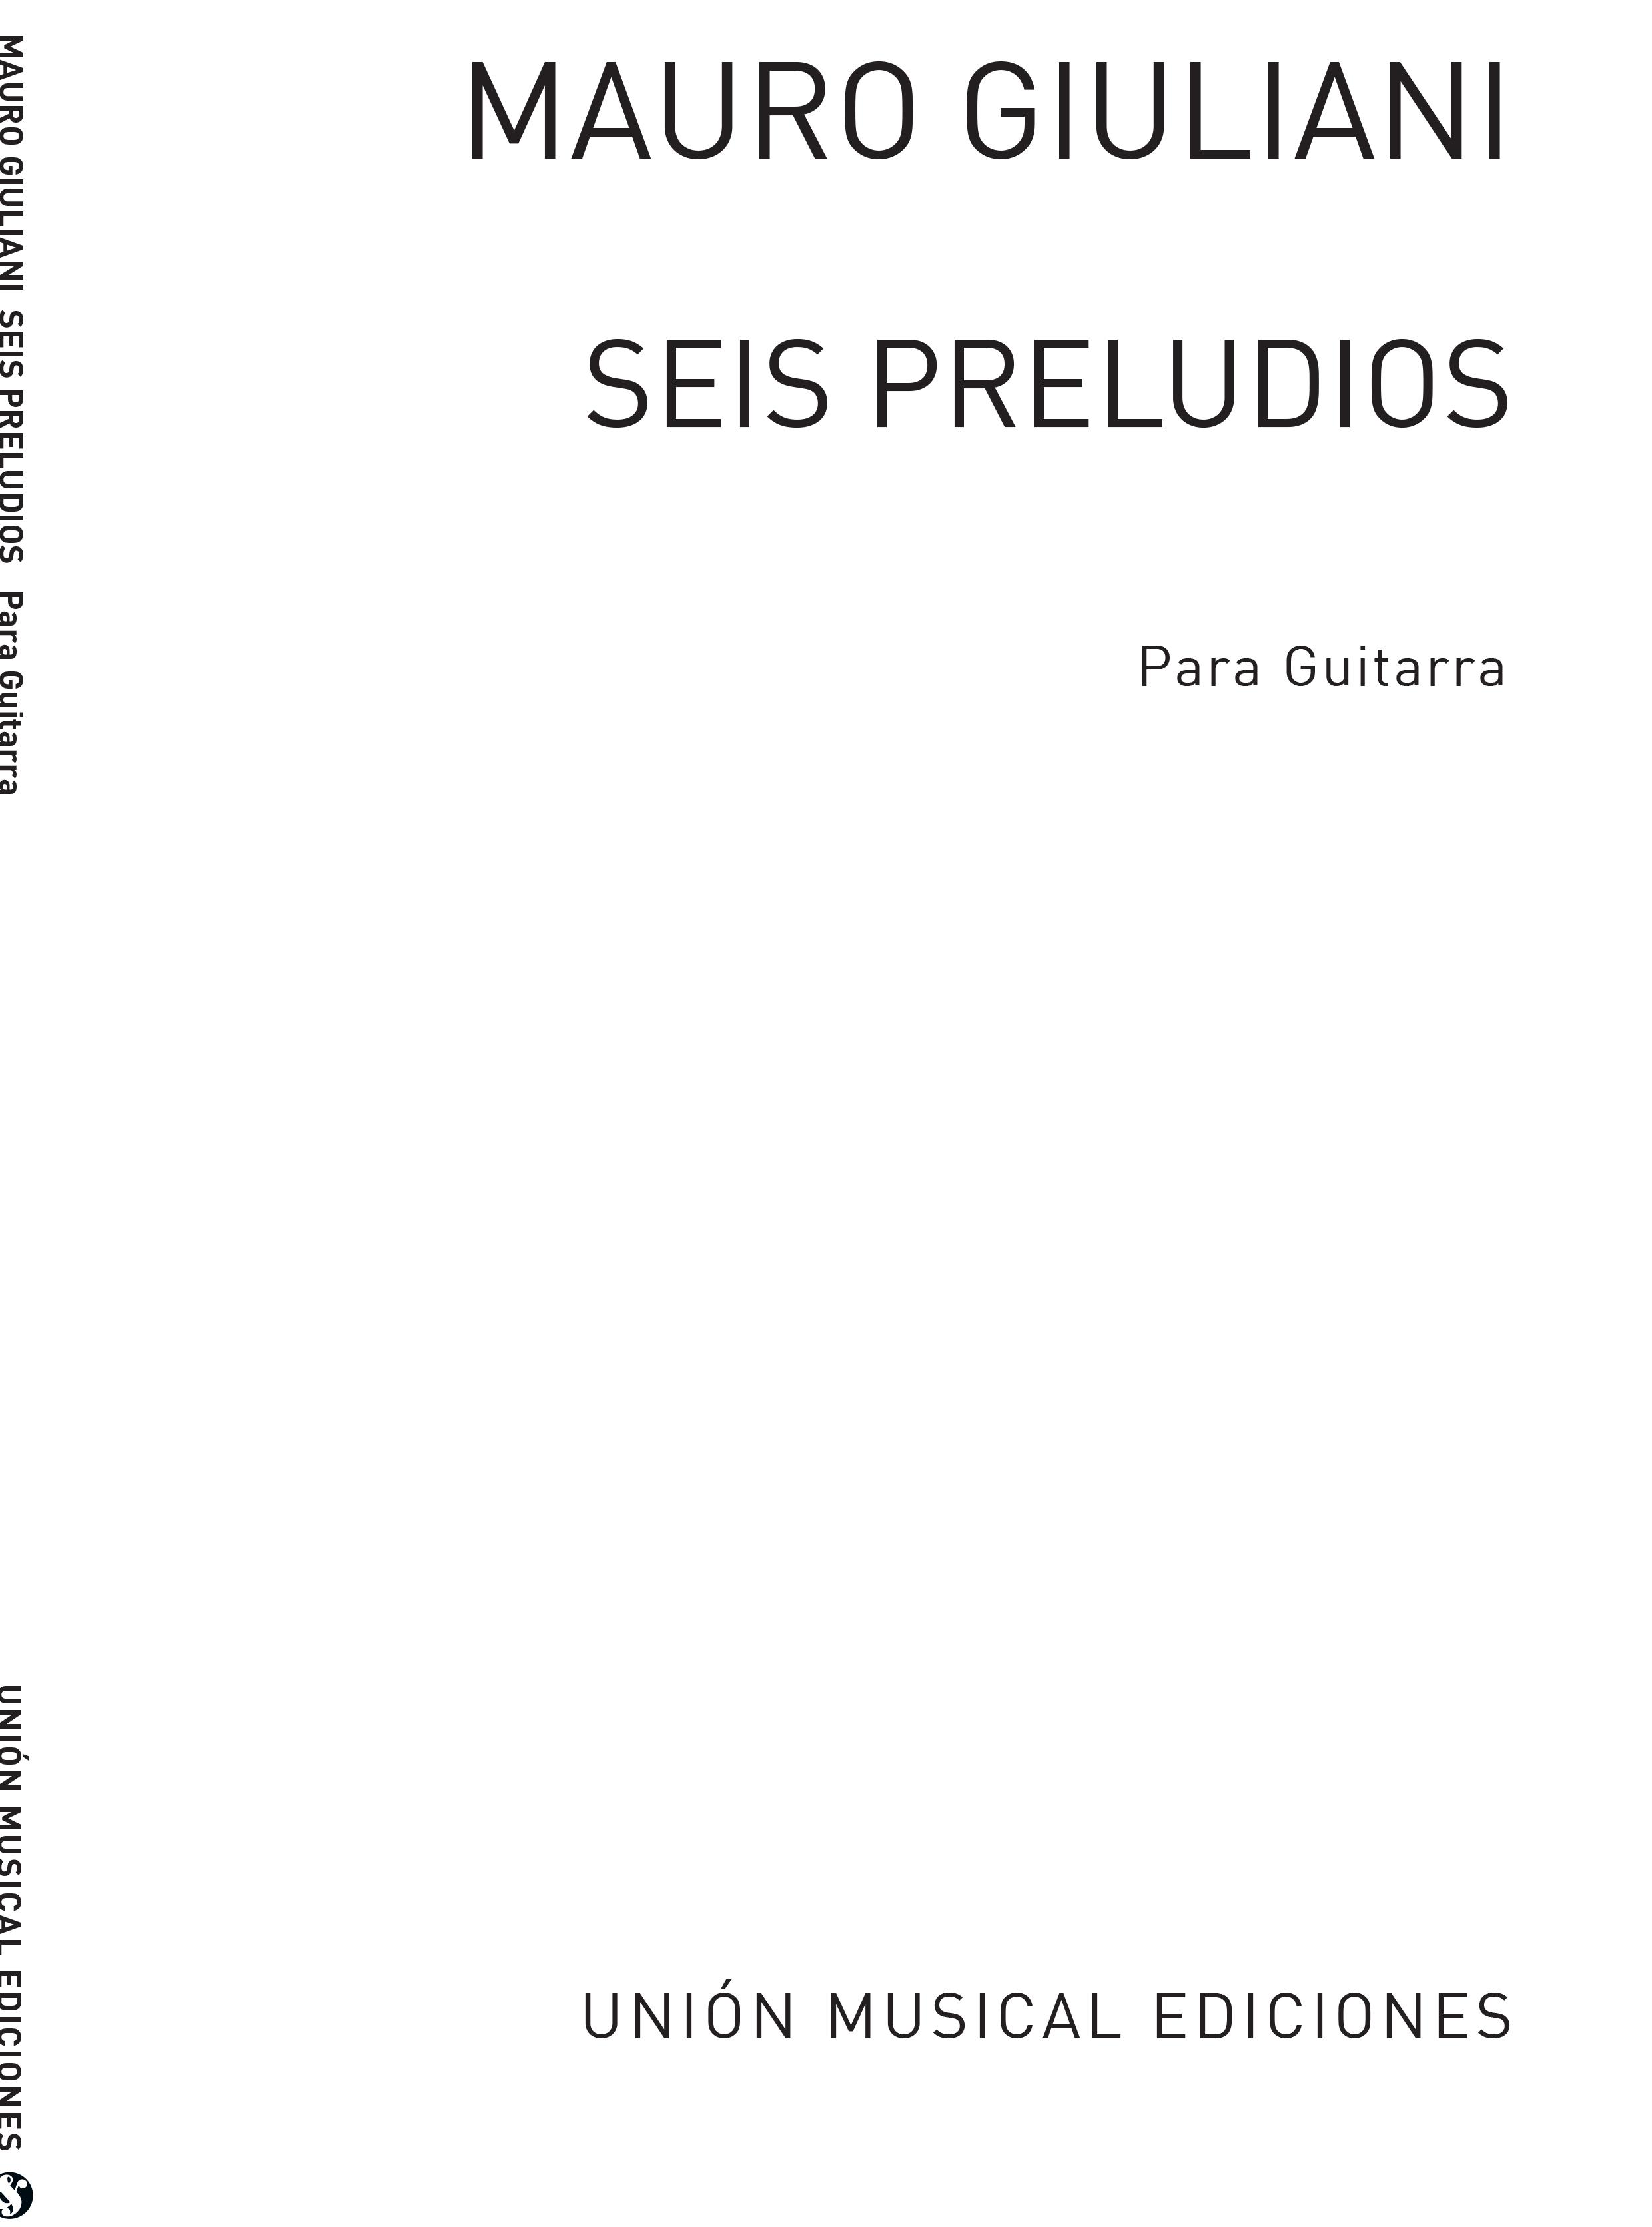 Mauro Giuliani: Seis Preludios Para Gitarra Op.83: Guitar: Instrumental Album